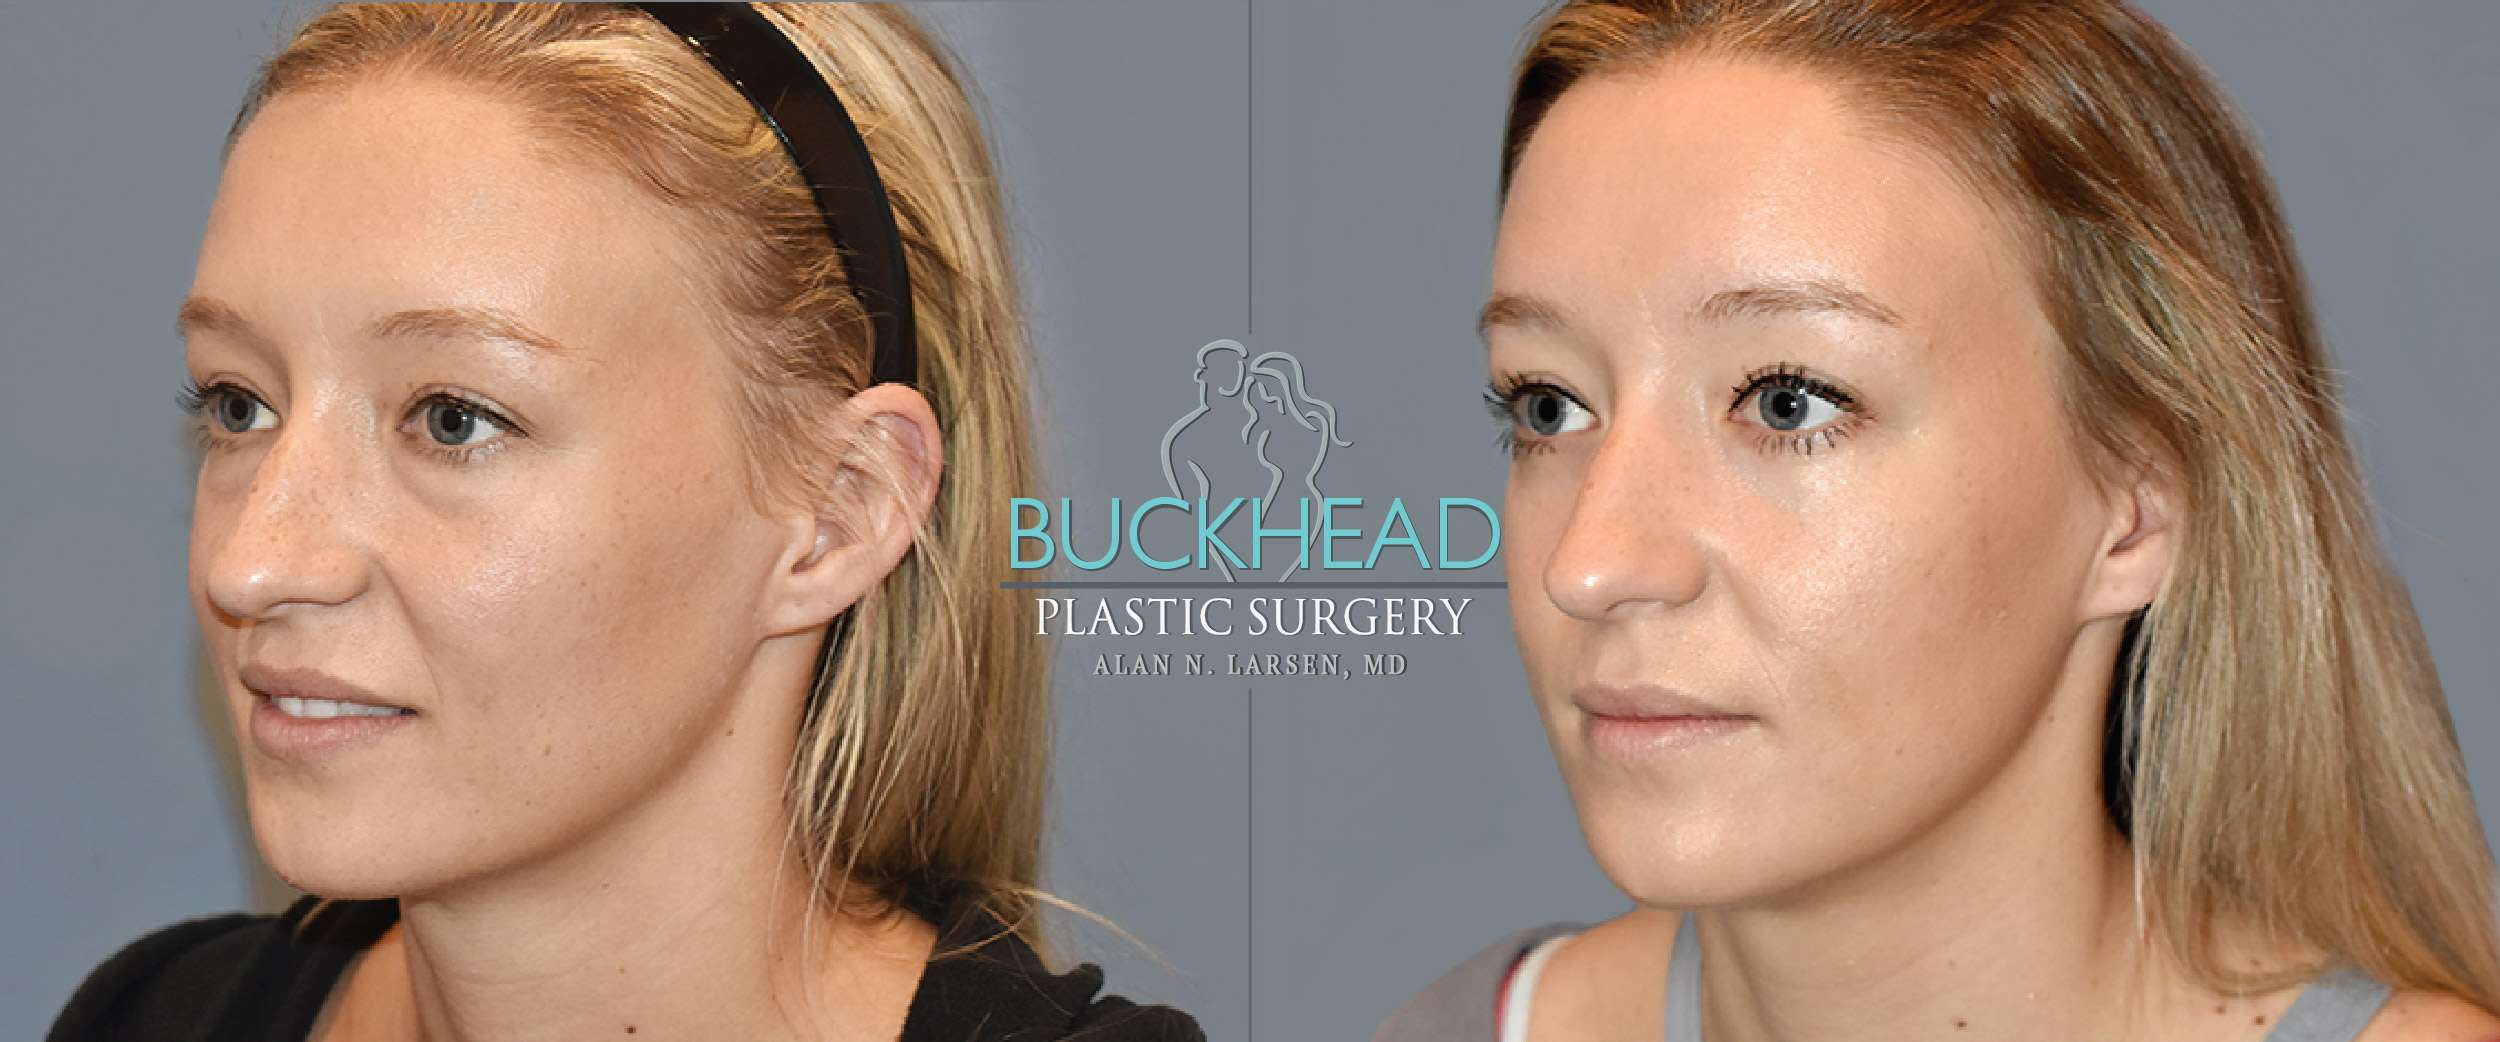 Before and After Photo Gallery | Blepharosty | Buckhead Plastic Surgery | Alan N. Larsen, MD | Board-Certified Plastic Surgeon | Atlanta GA